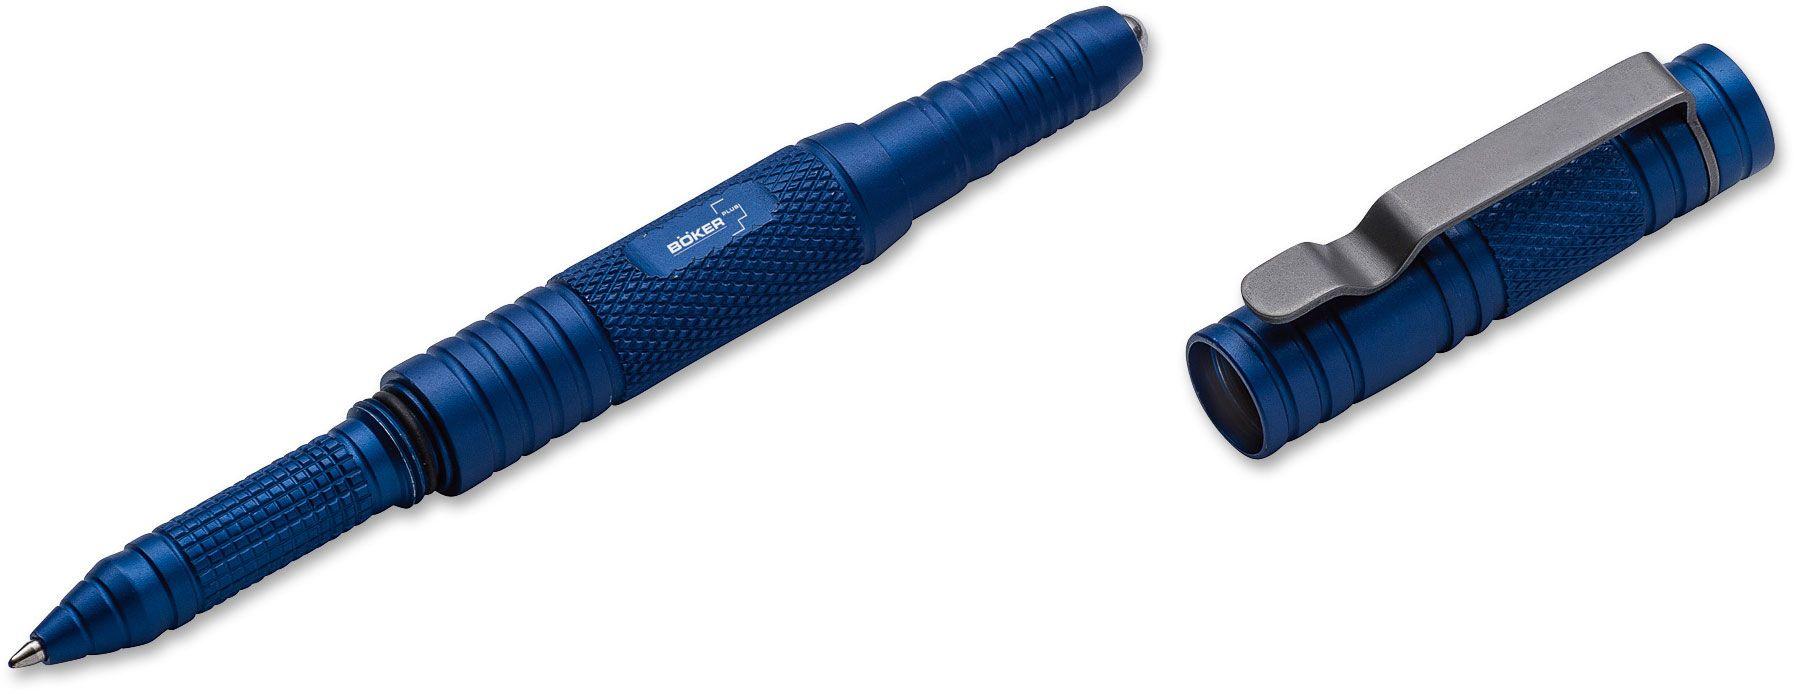 Boker Plus Tactical Pen, Blue Aluminum